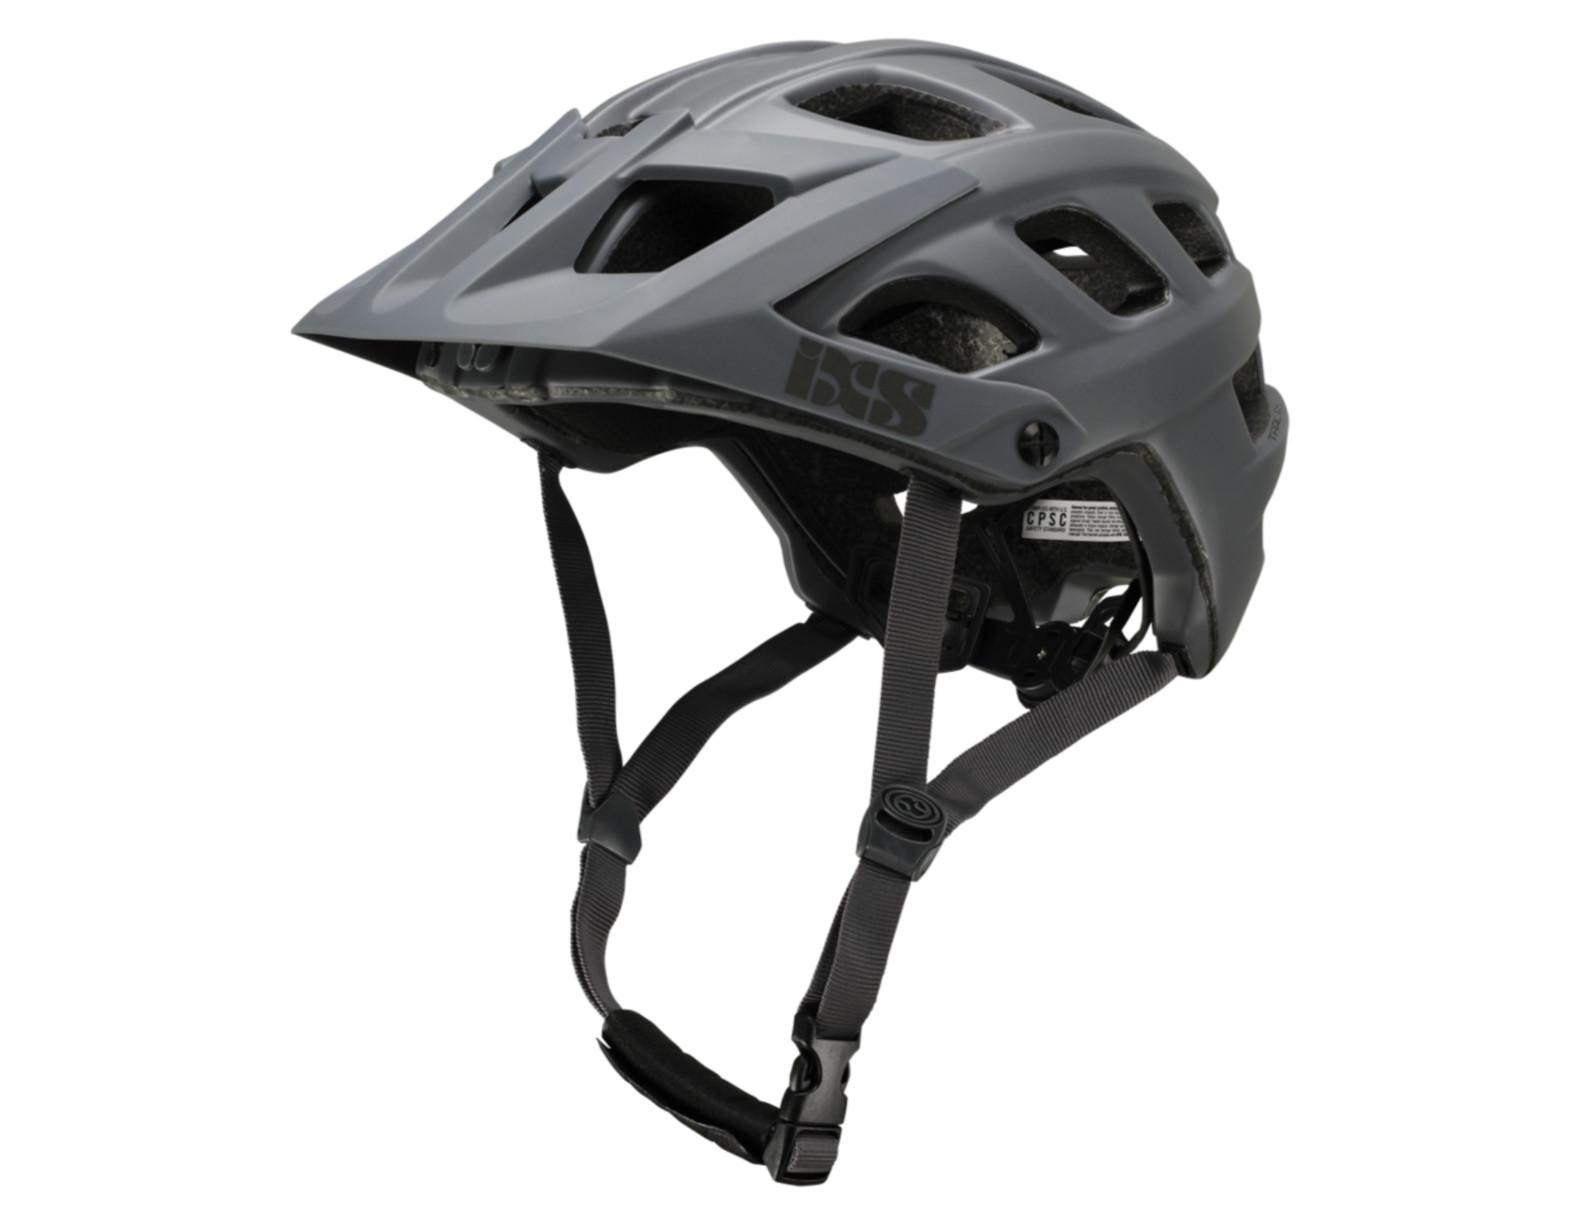 Ixs Trail Rs Evo Helmet Reviews Comparisons Specs Mountain Bike Open Face Helmets Vital Mtb